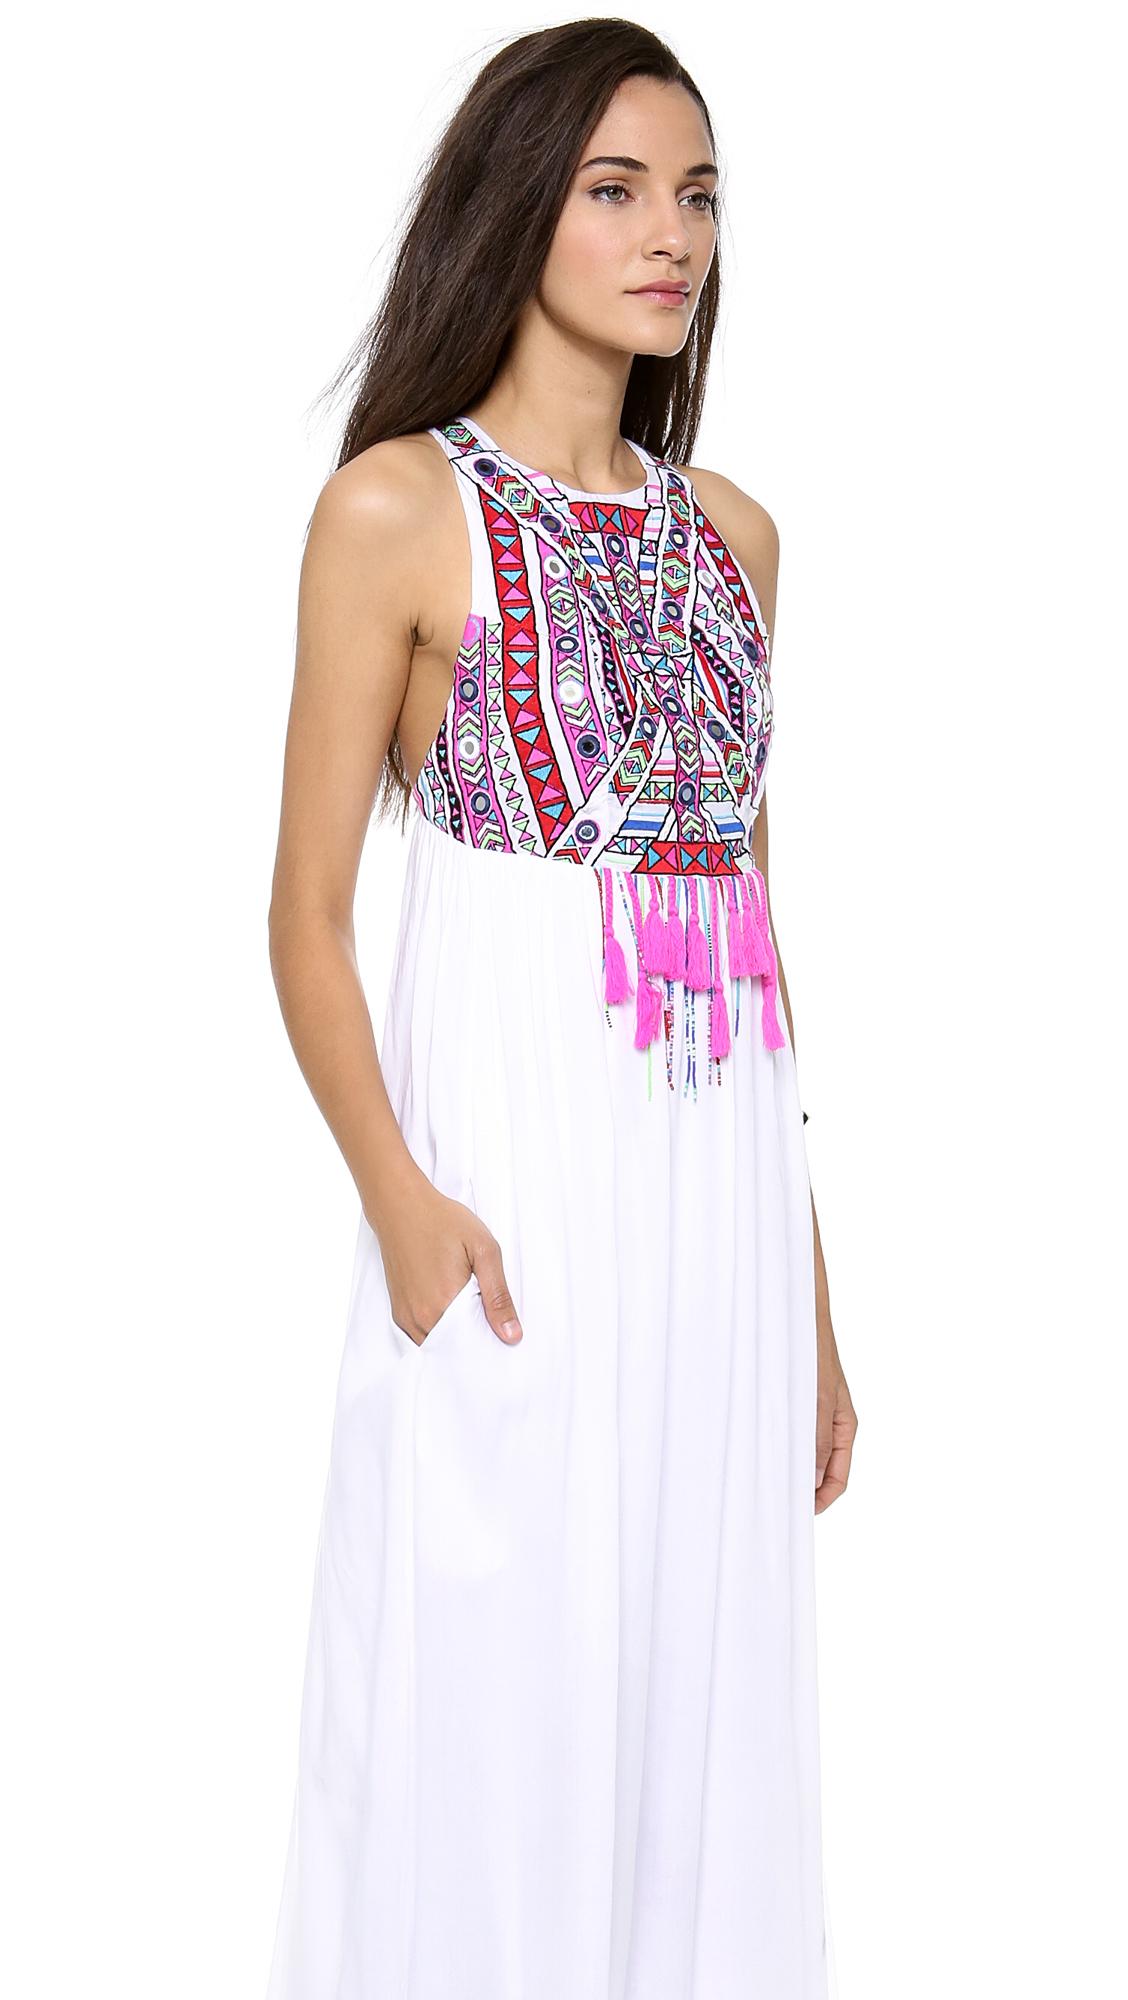 Maxi dress with embroidery makaroka